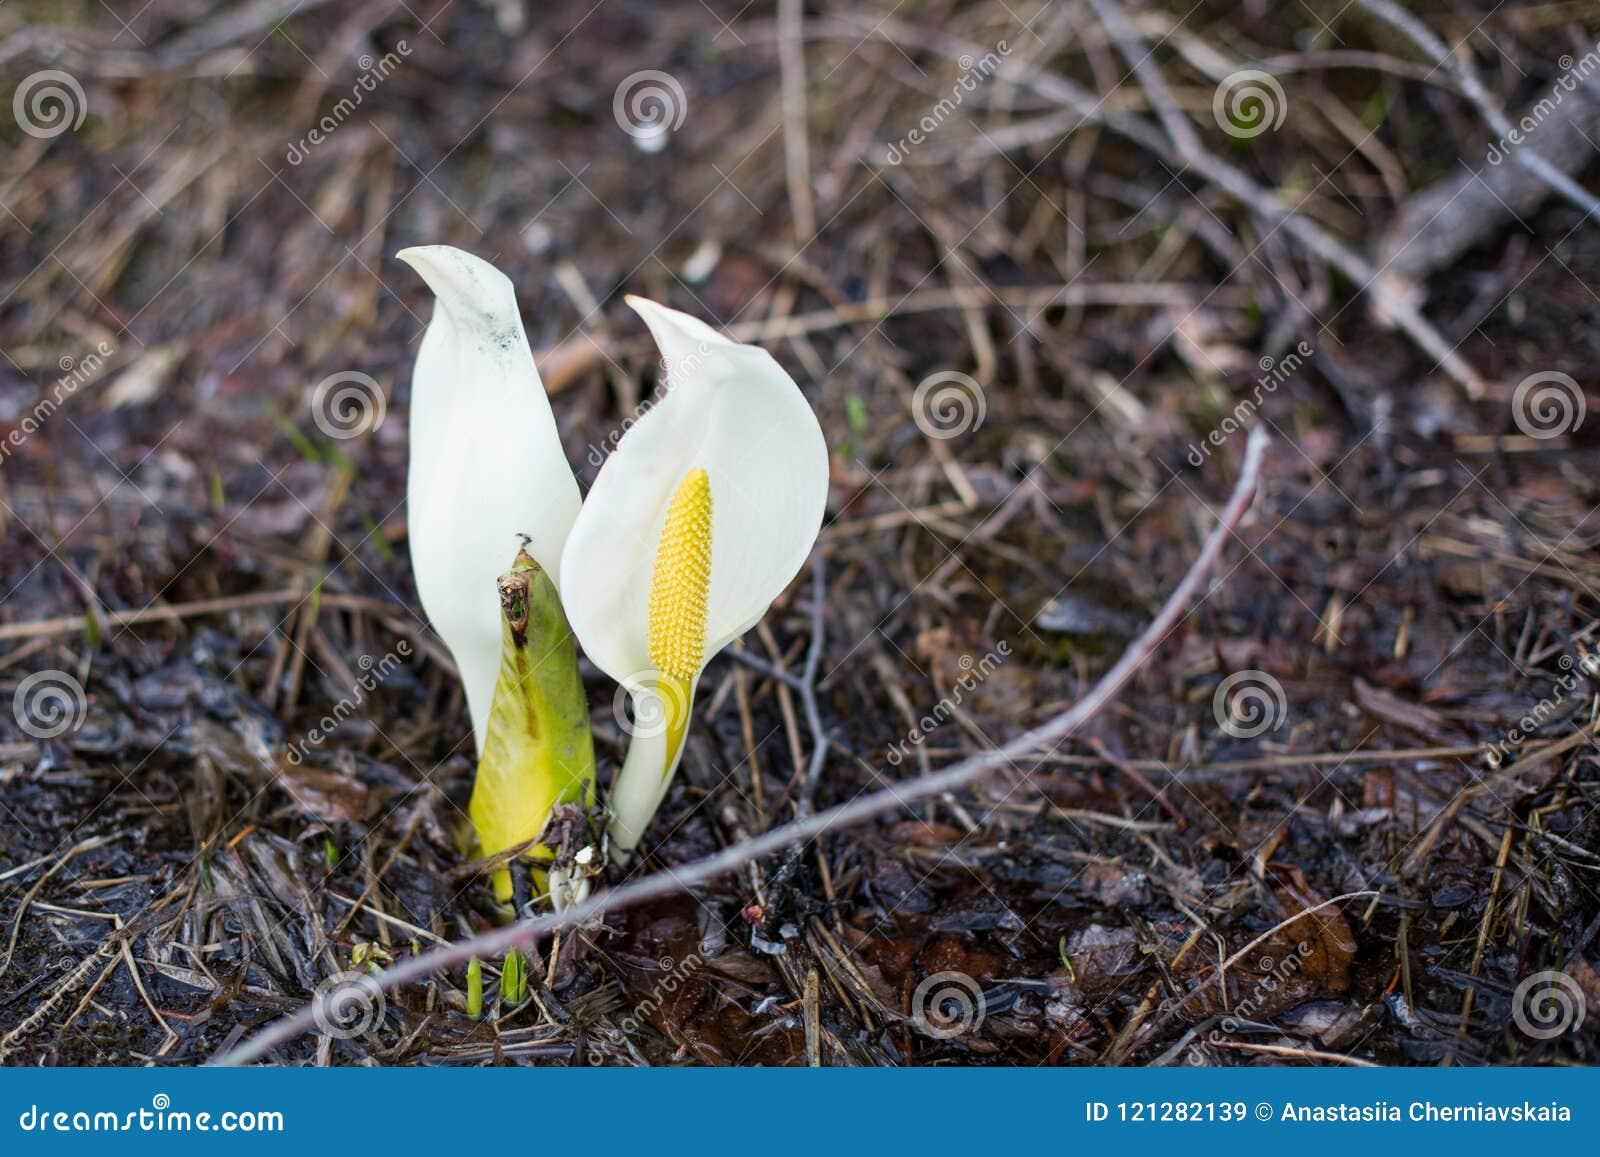 Image of wild poisonous white flowers called calla palustris in download image of wild poisonous white flowers called calla palustris in spring season stock image mightylinksfo